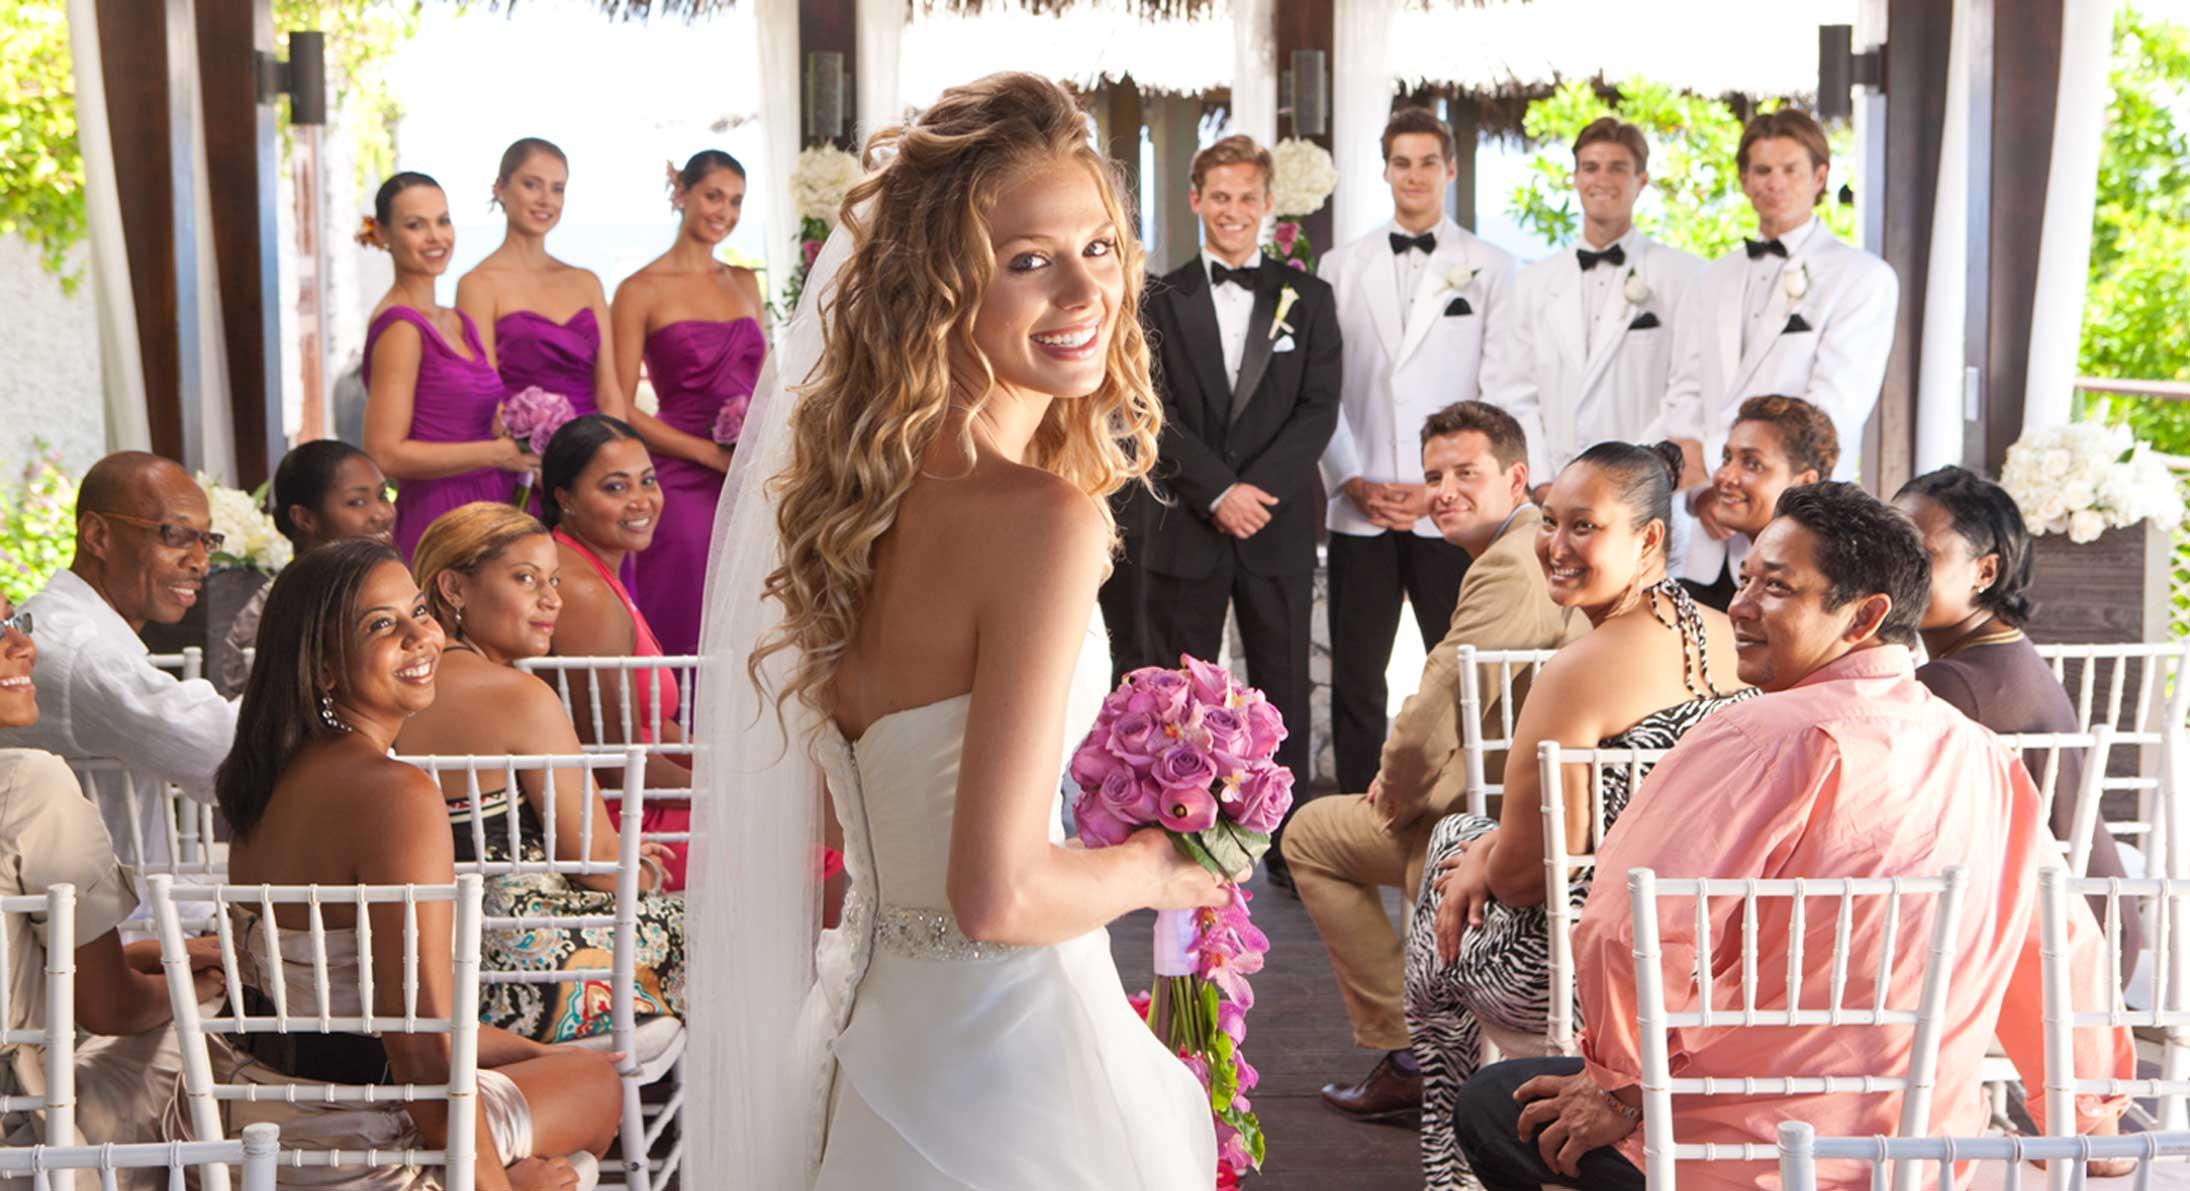 e012a52de2b95 Destination Wedding Guest Accommodations   Packages